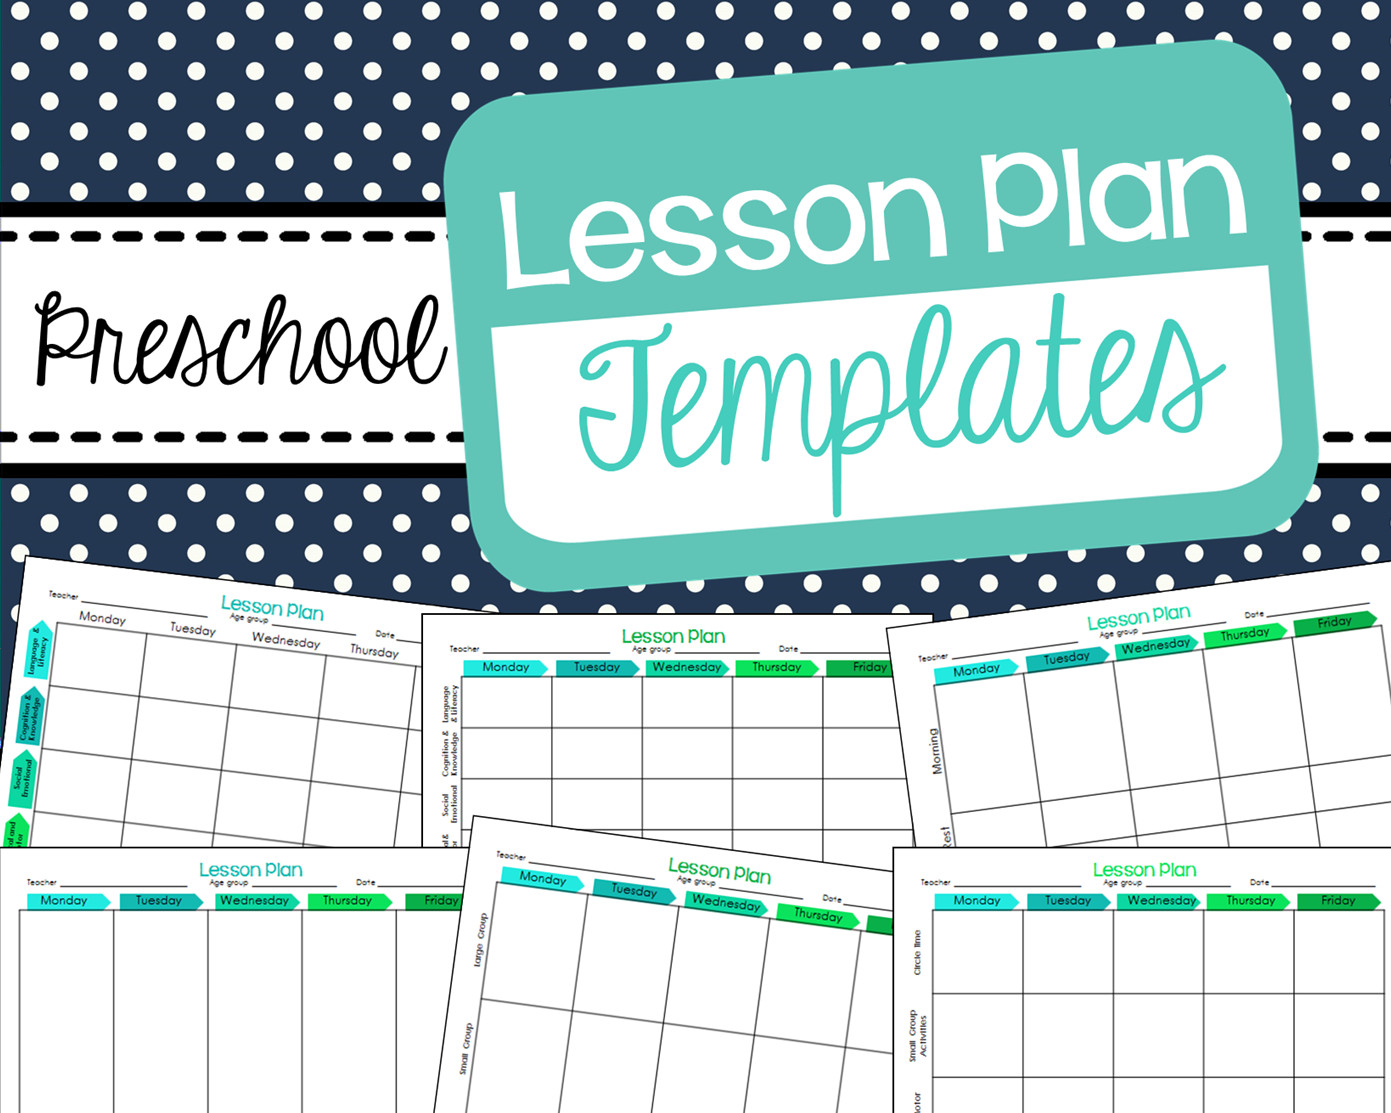 Lesson Plan Templates Preschool Free Preschool Lesson Plan Templates